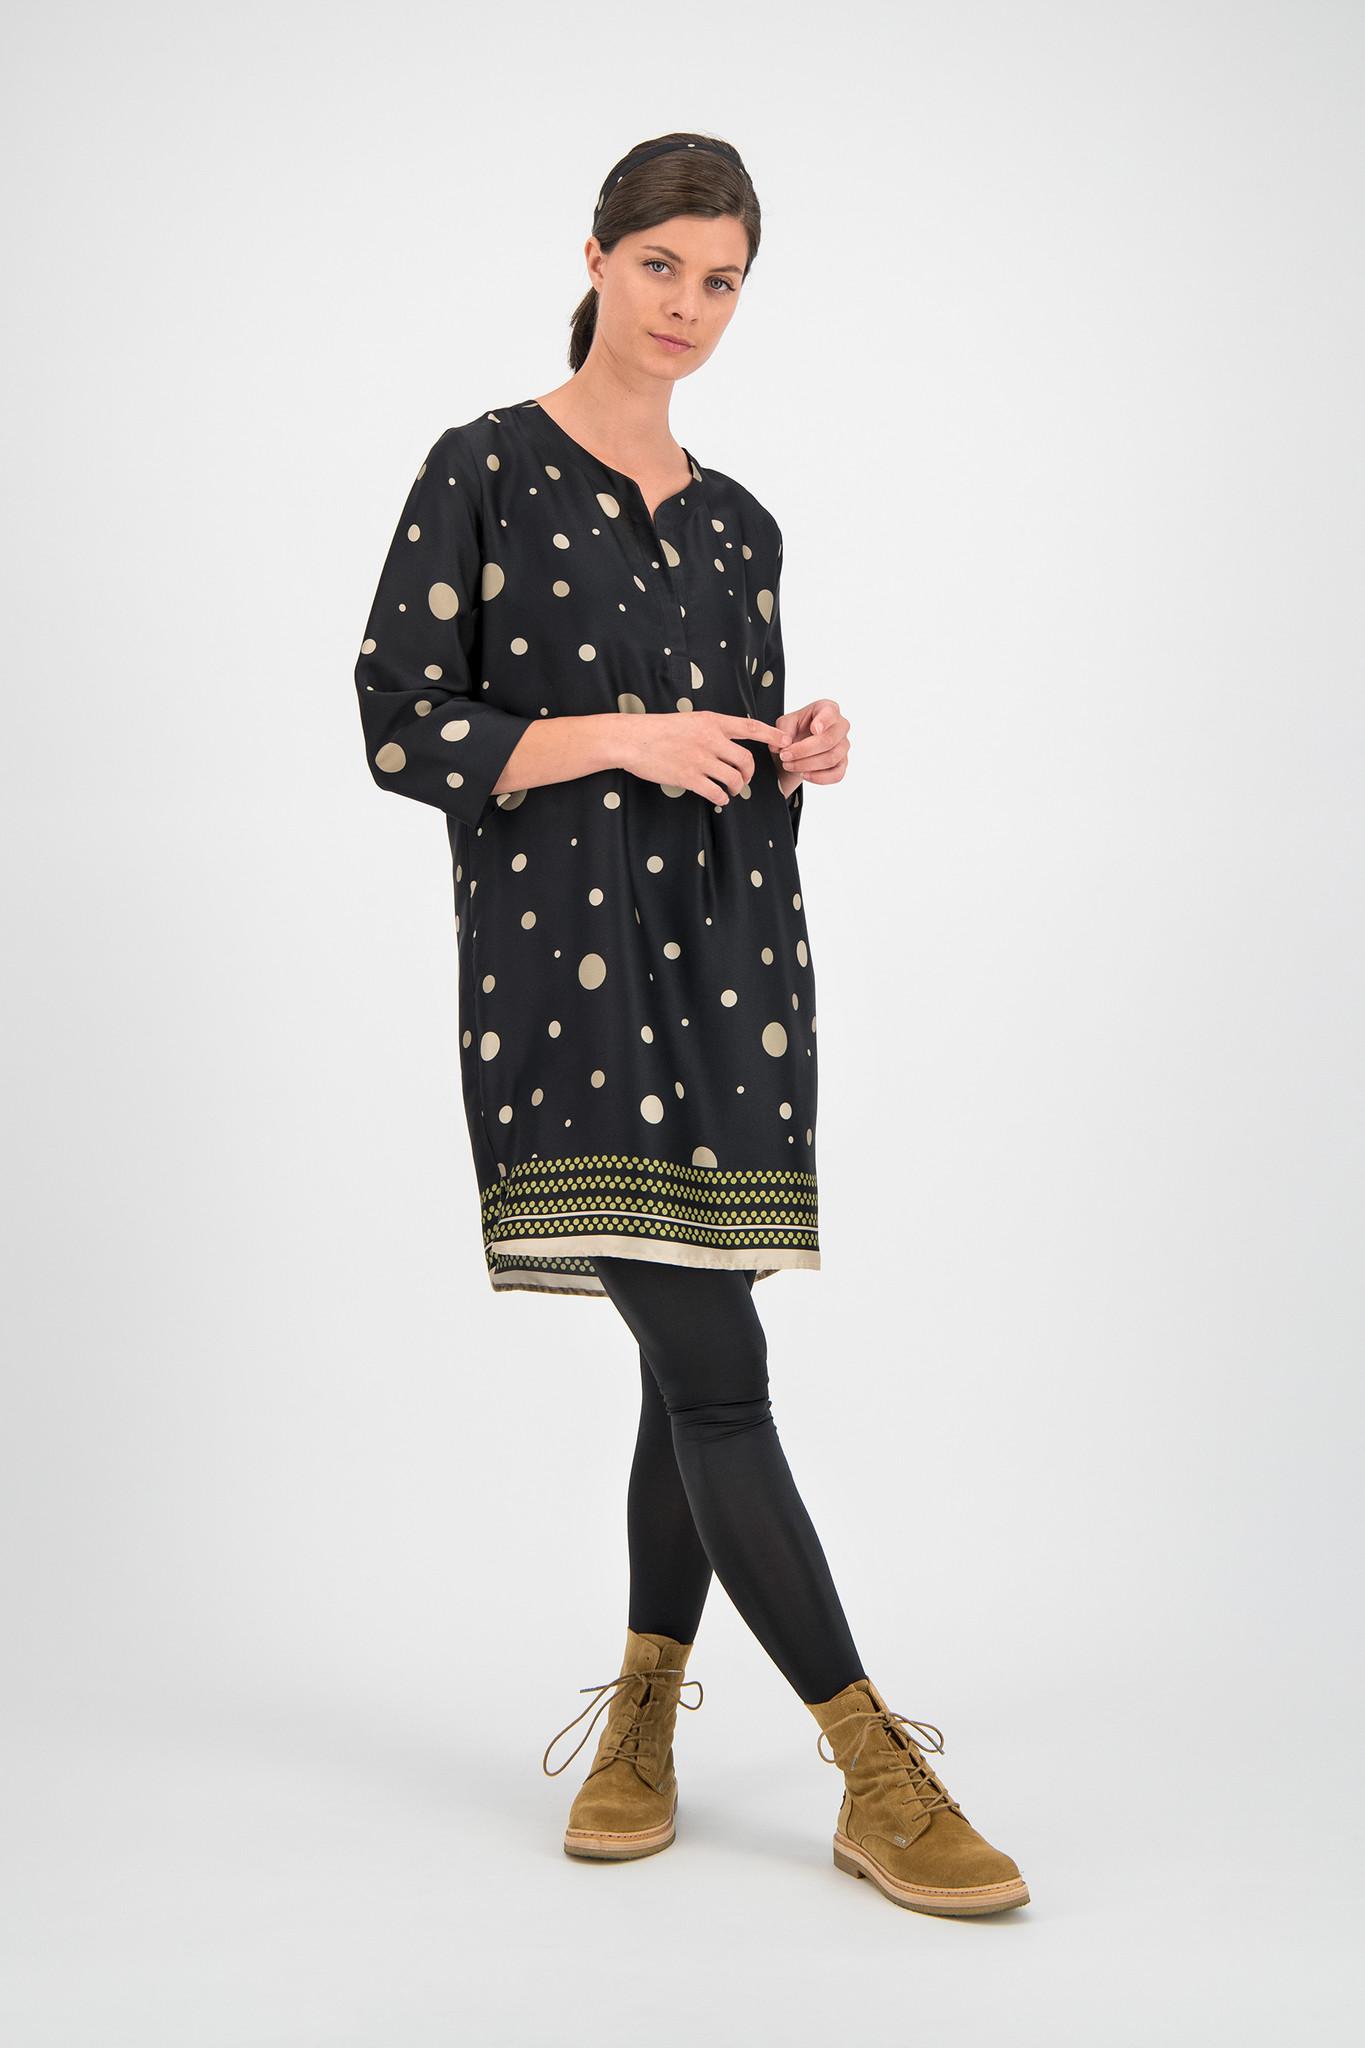 SYLVER Panel Dot Dress - Moss